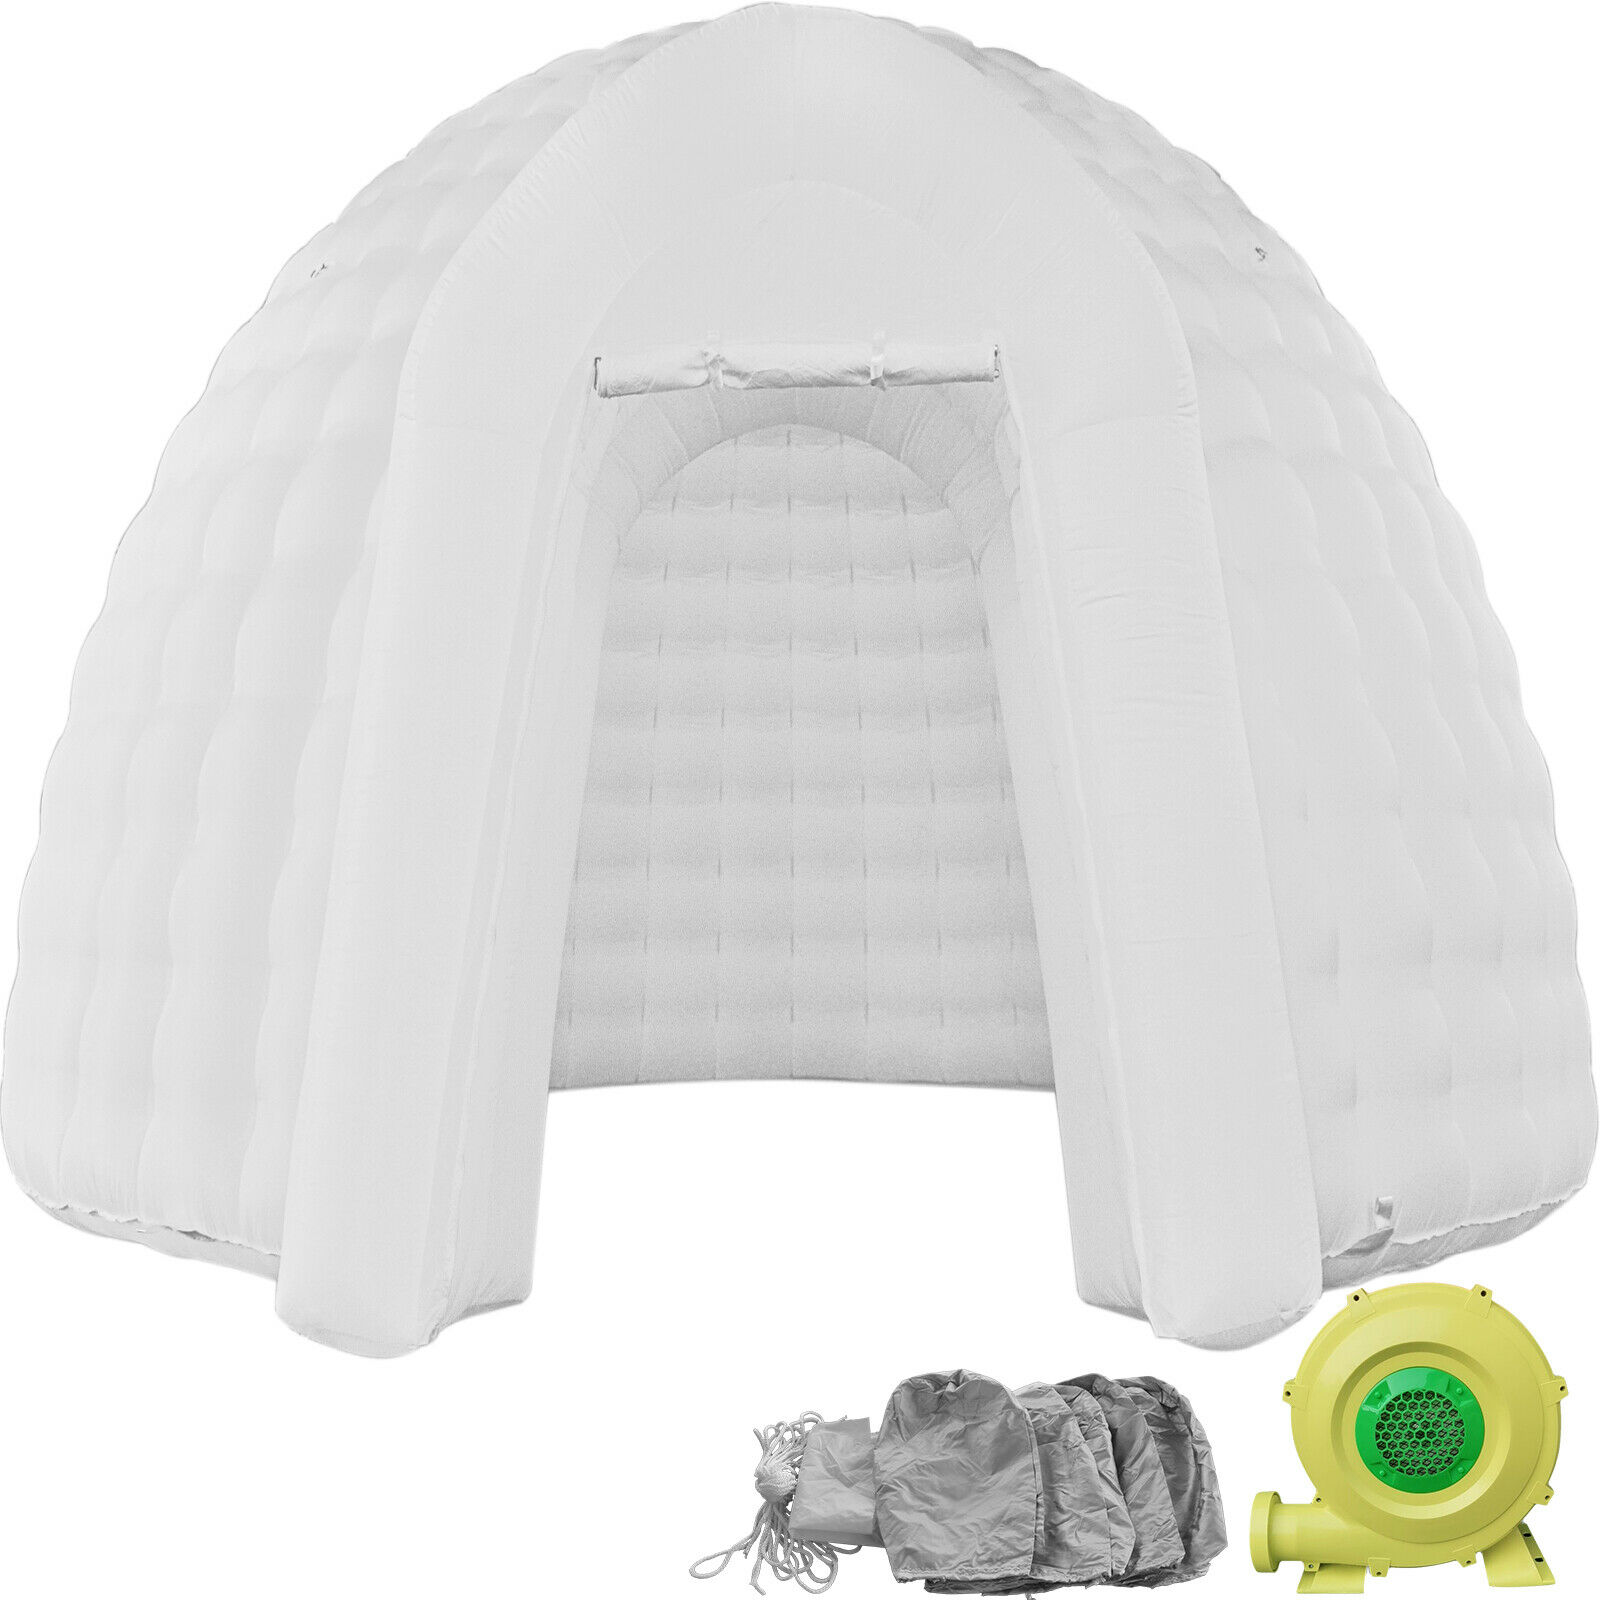 VEVOR Inflatable Igloo Dome Tent